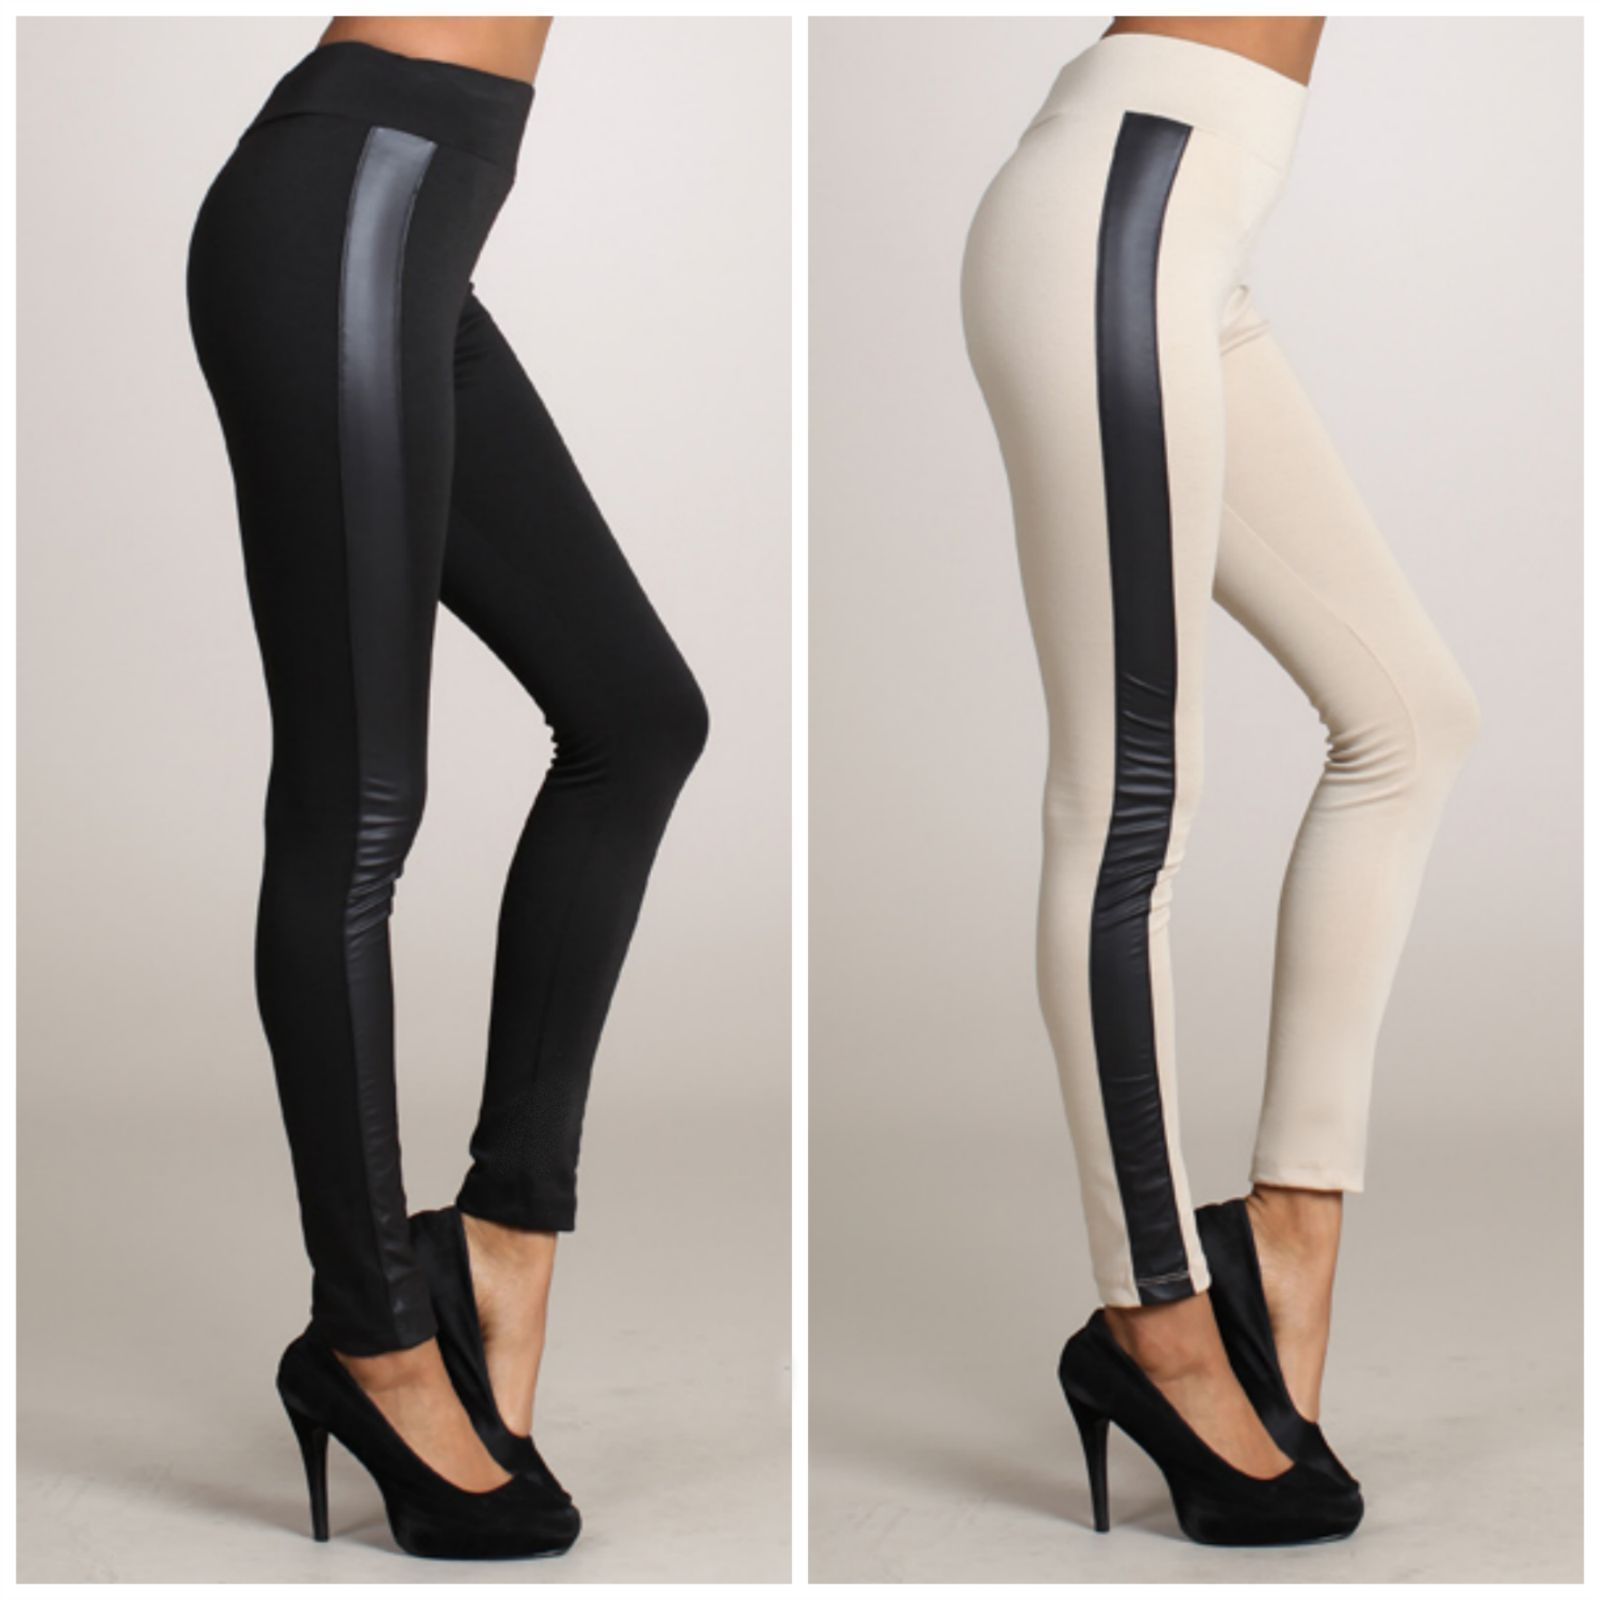 Faux leather inset leggings ponte knit tuxedo side stripe skinny ...